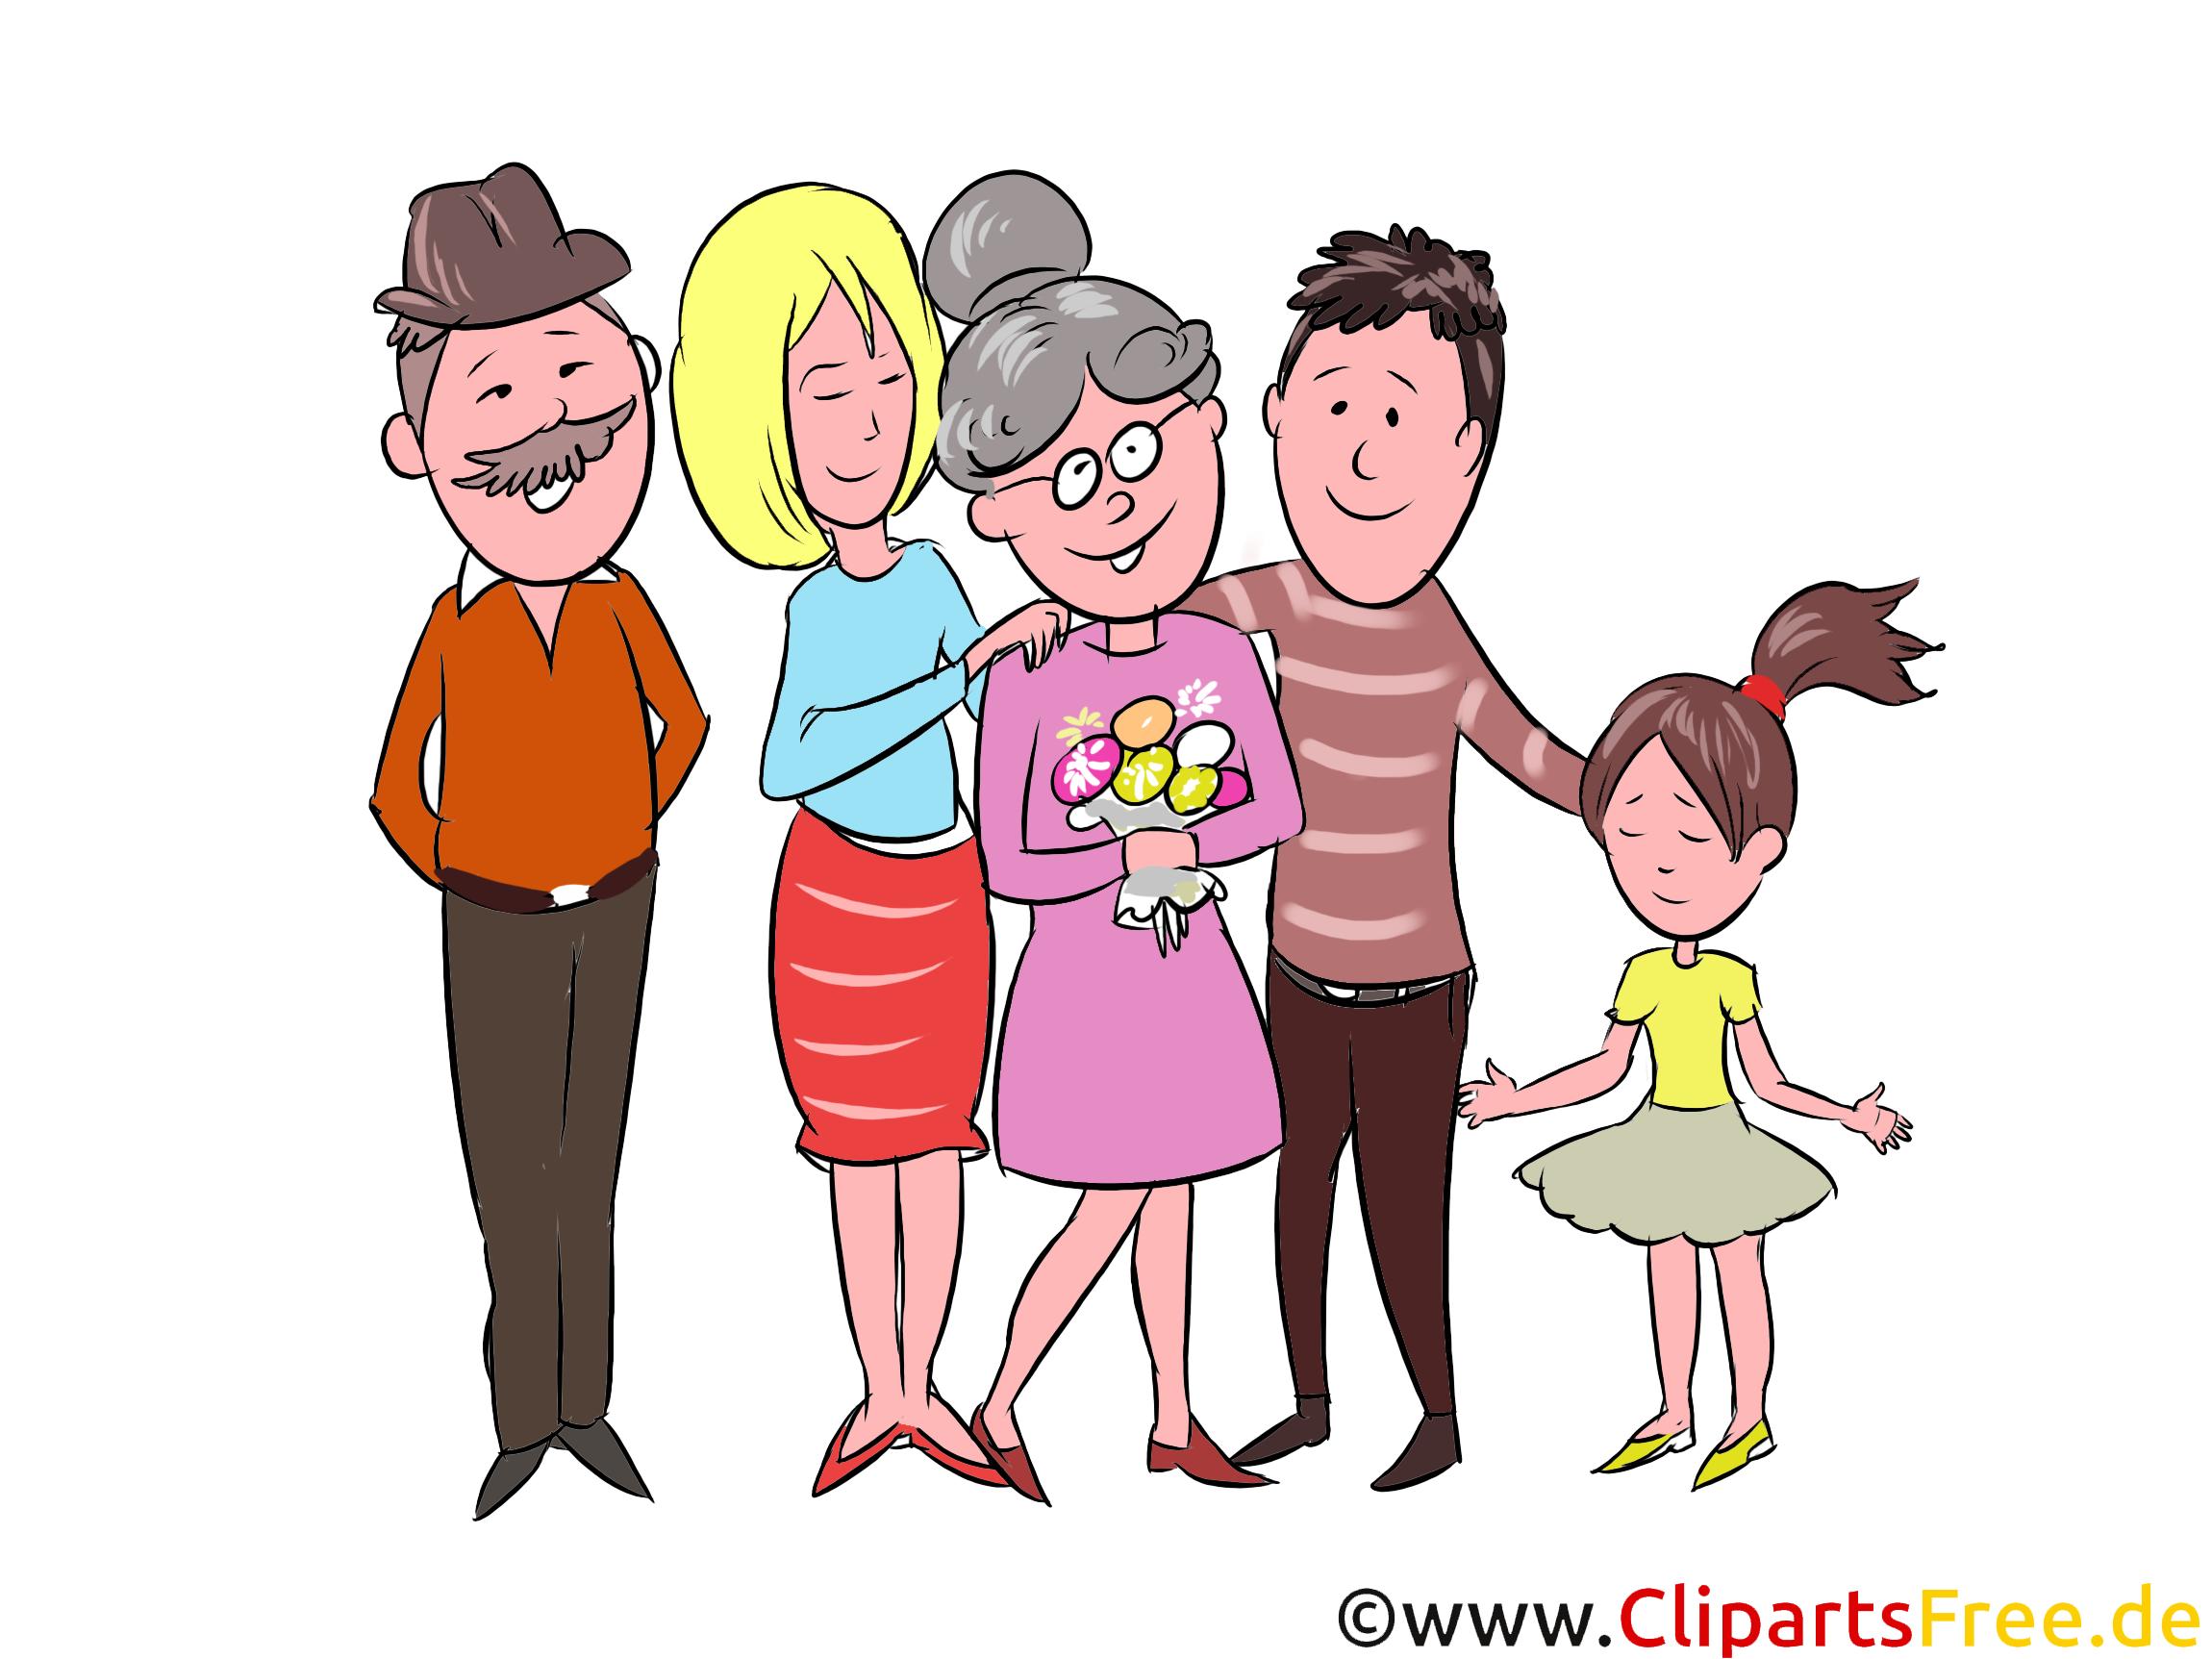 Großmutter, Großvater, Eheleute, Kinder Clipart, Illustration, Bild